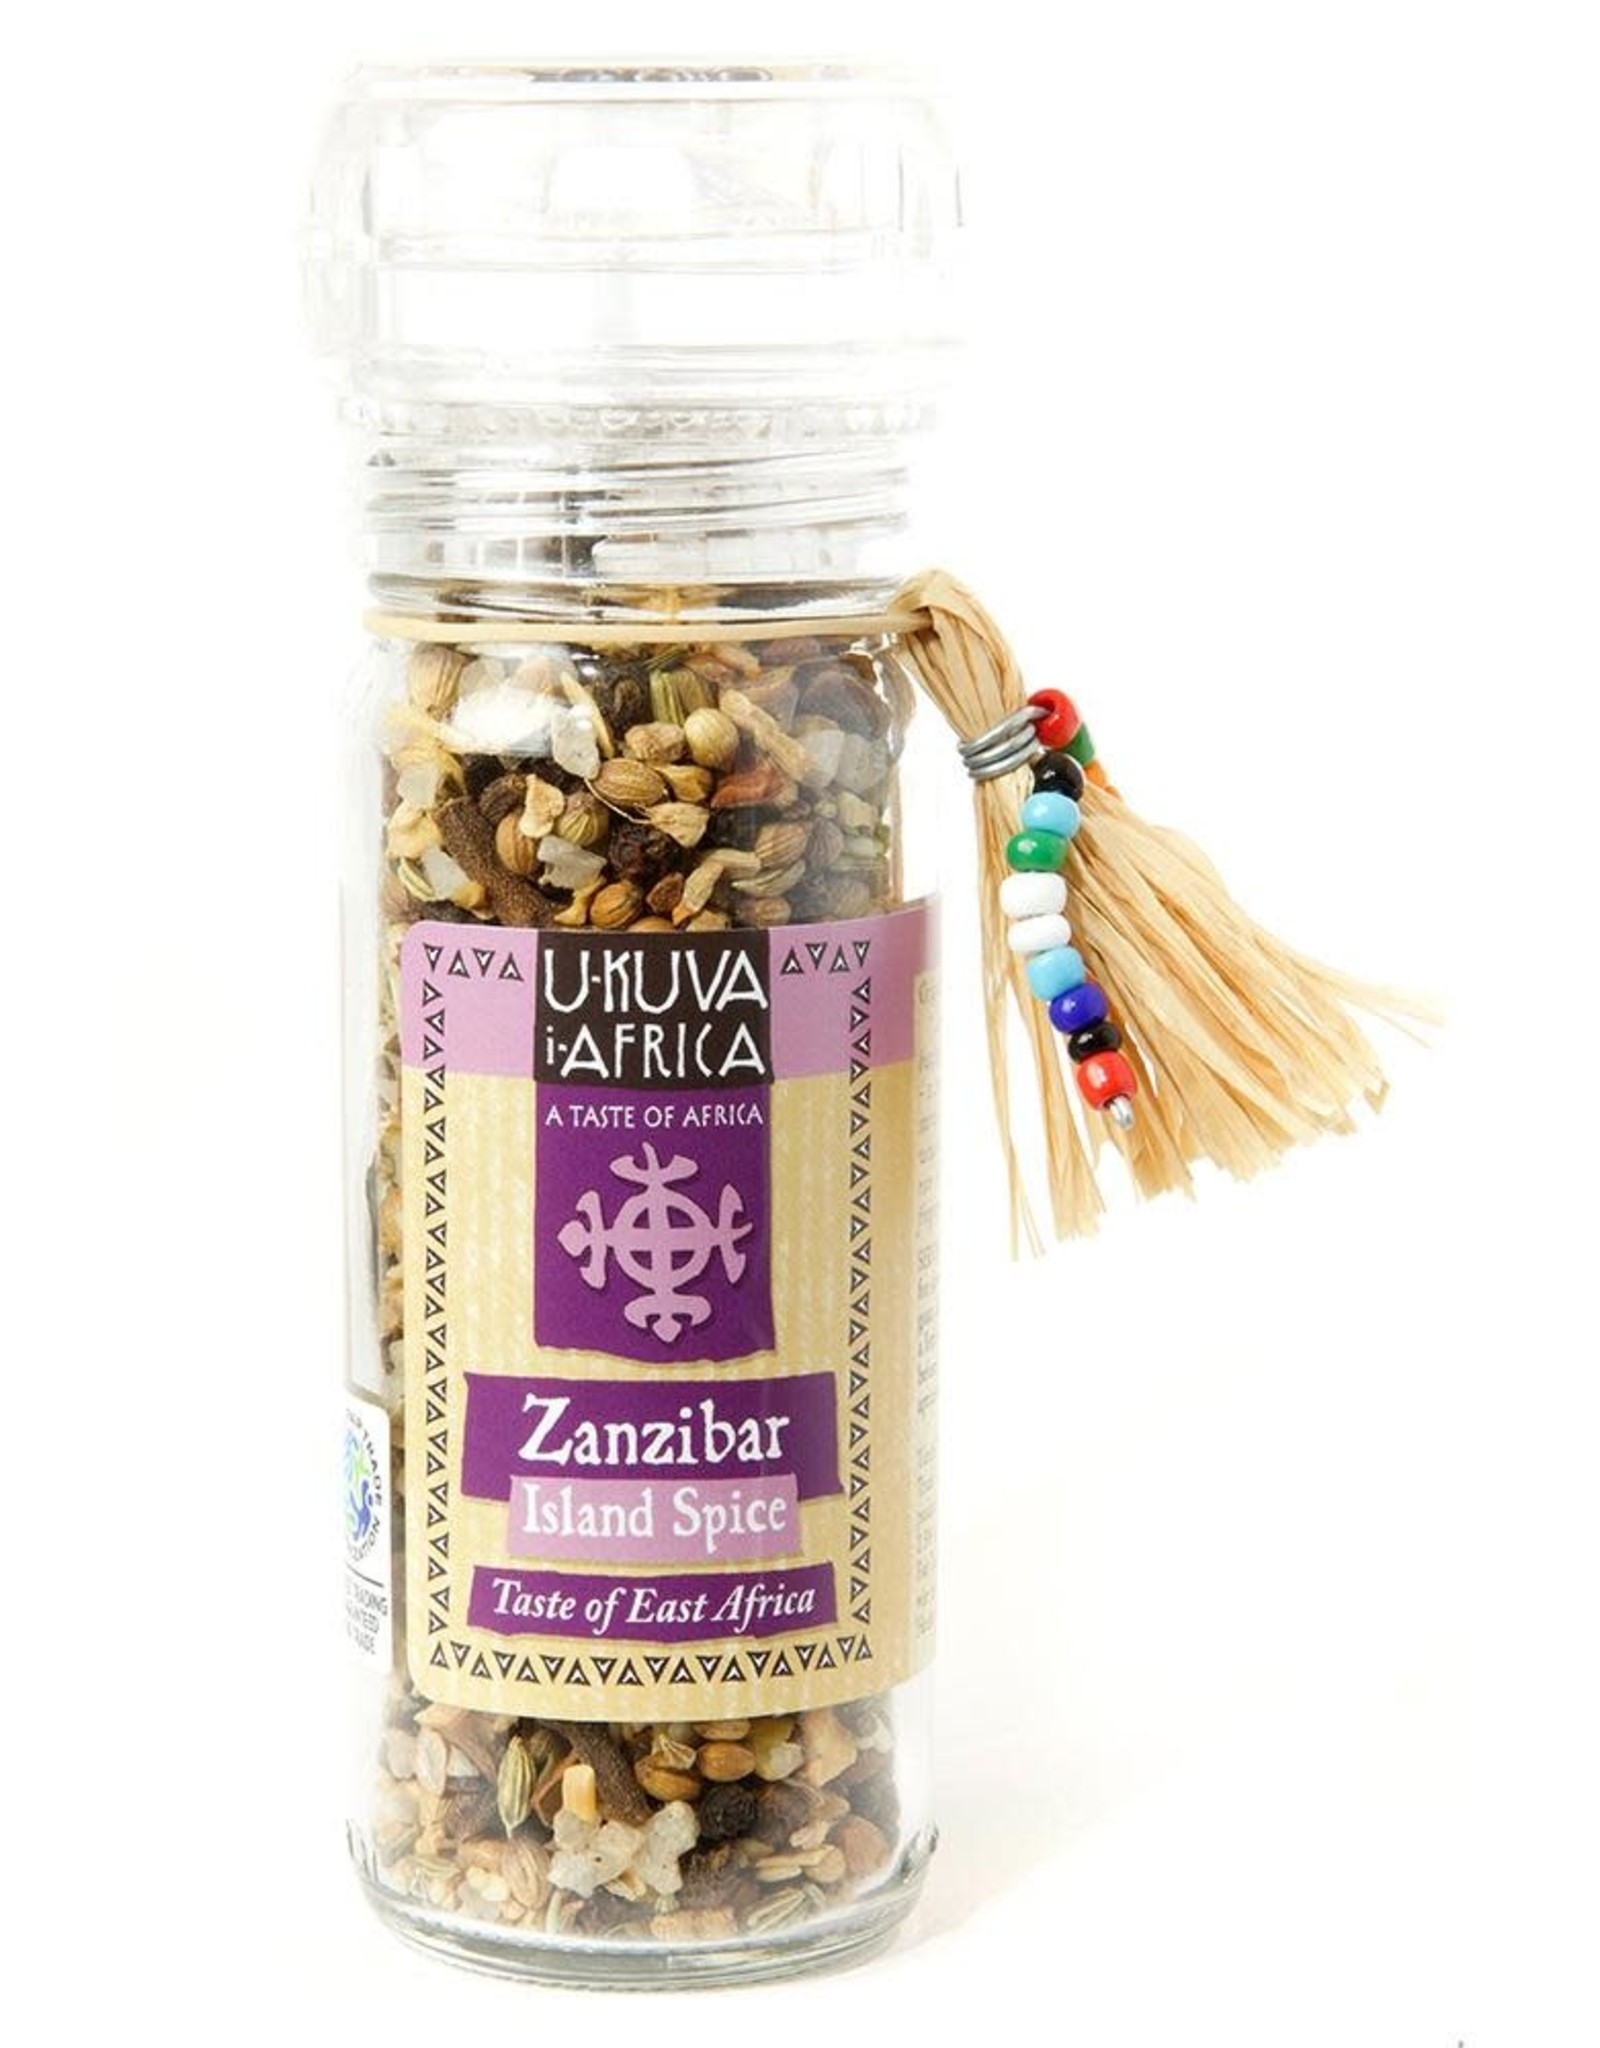 Swahili Wholesale Ukava iAfrica Zanzibar Island Spice Grinder, South Africa